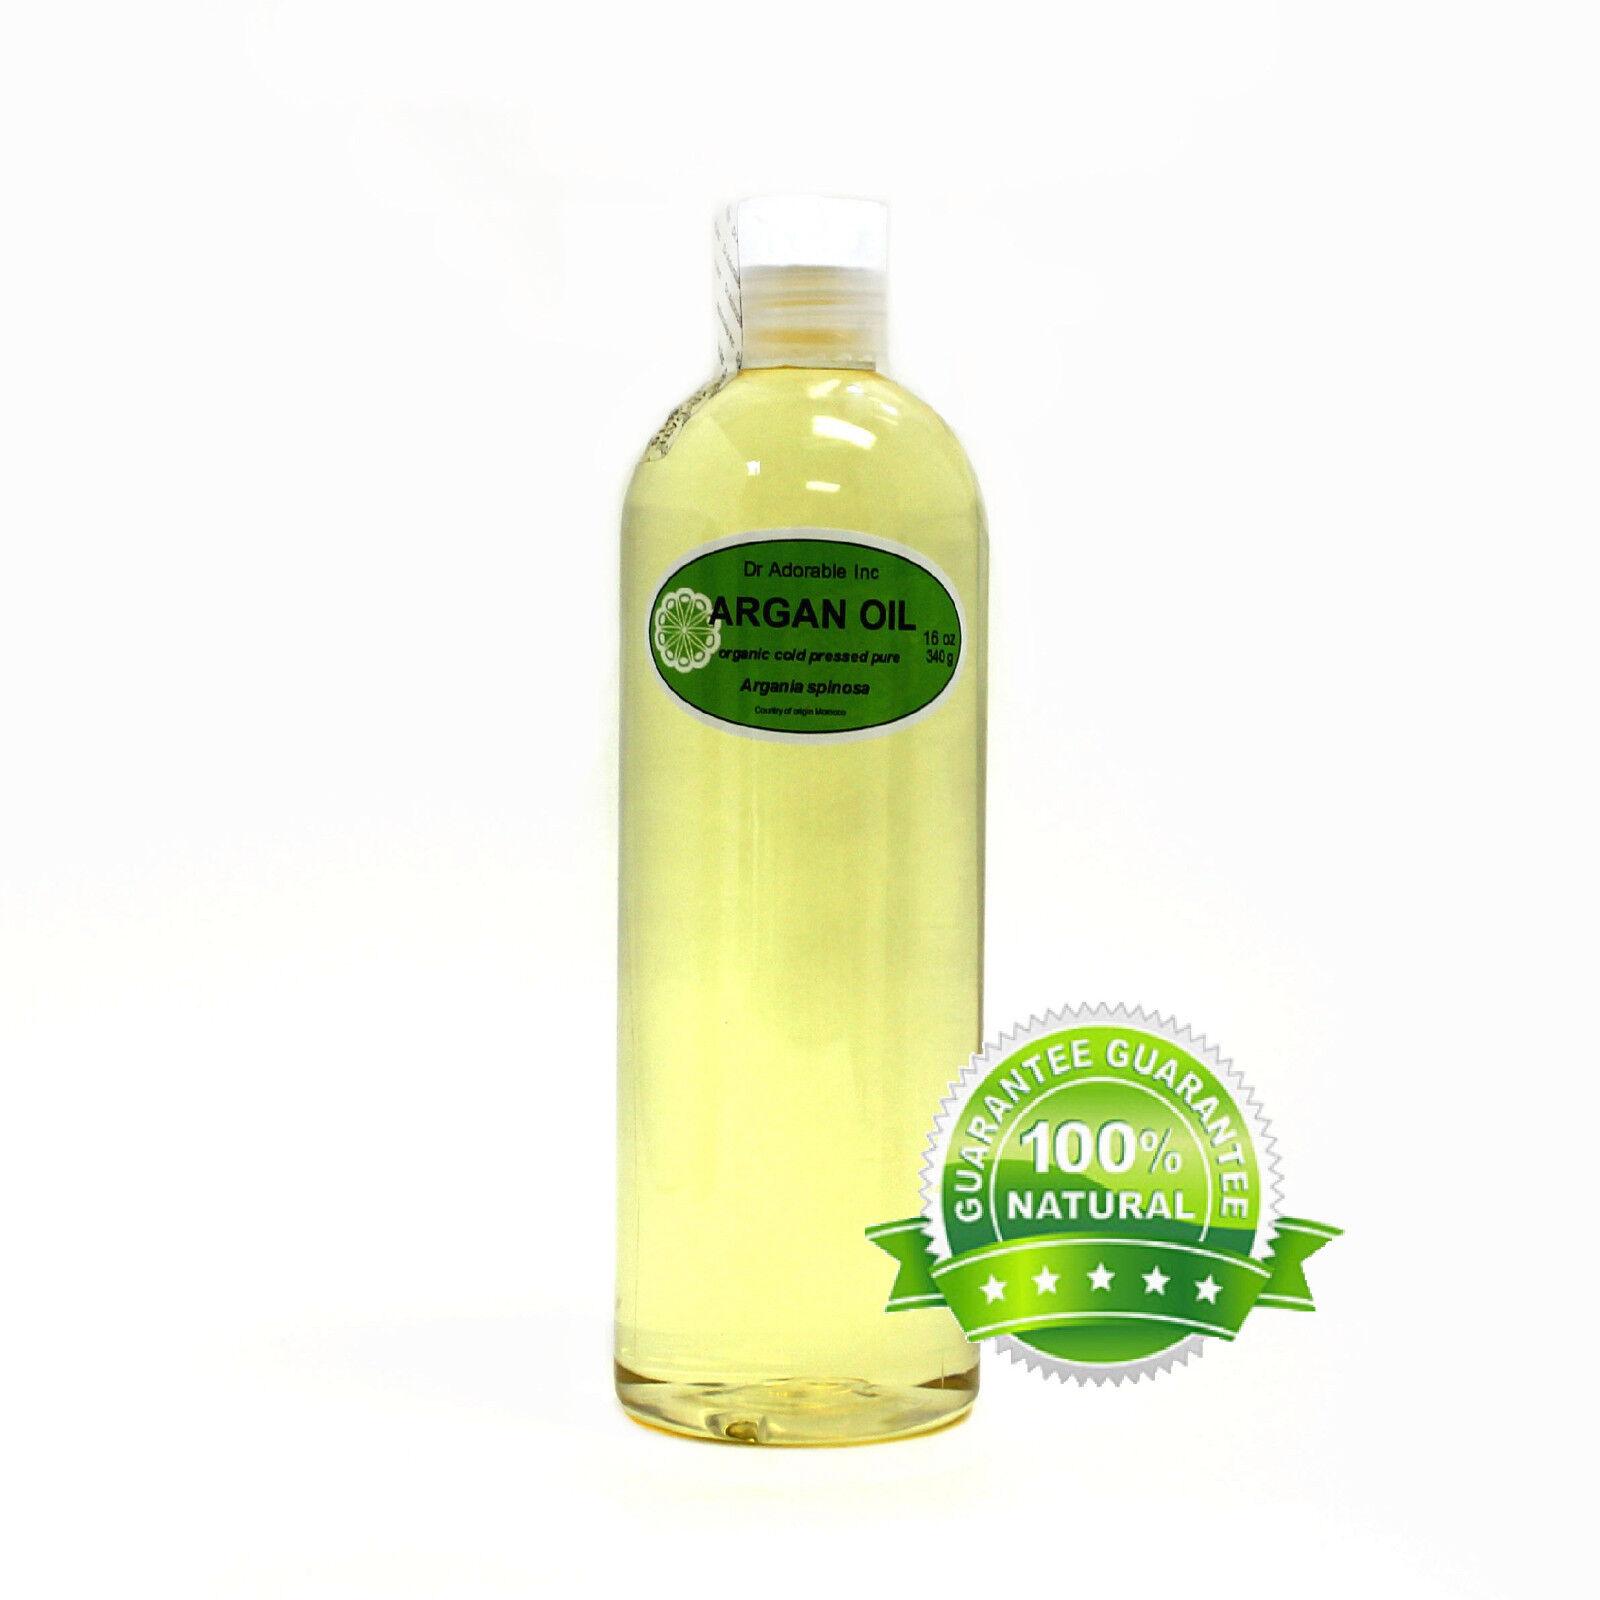 Moroccan Argan Tree Oil Hair Treatment Serum By Dr.adorab...